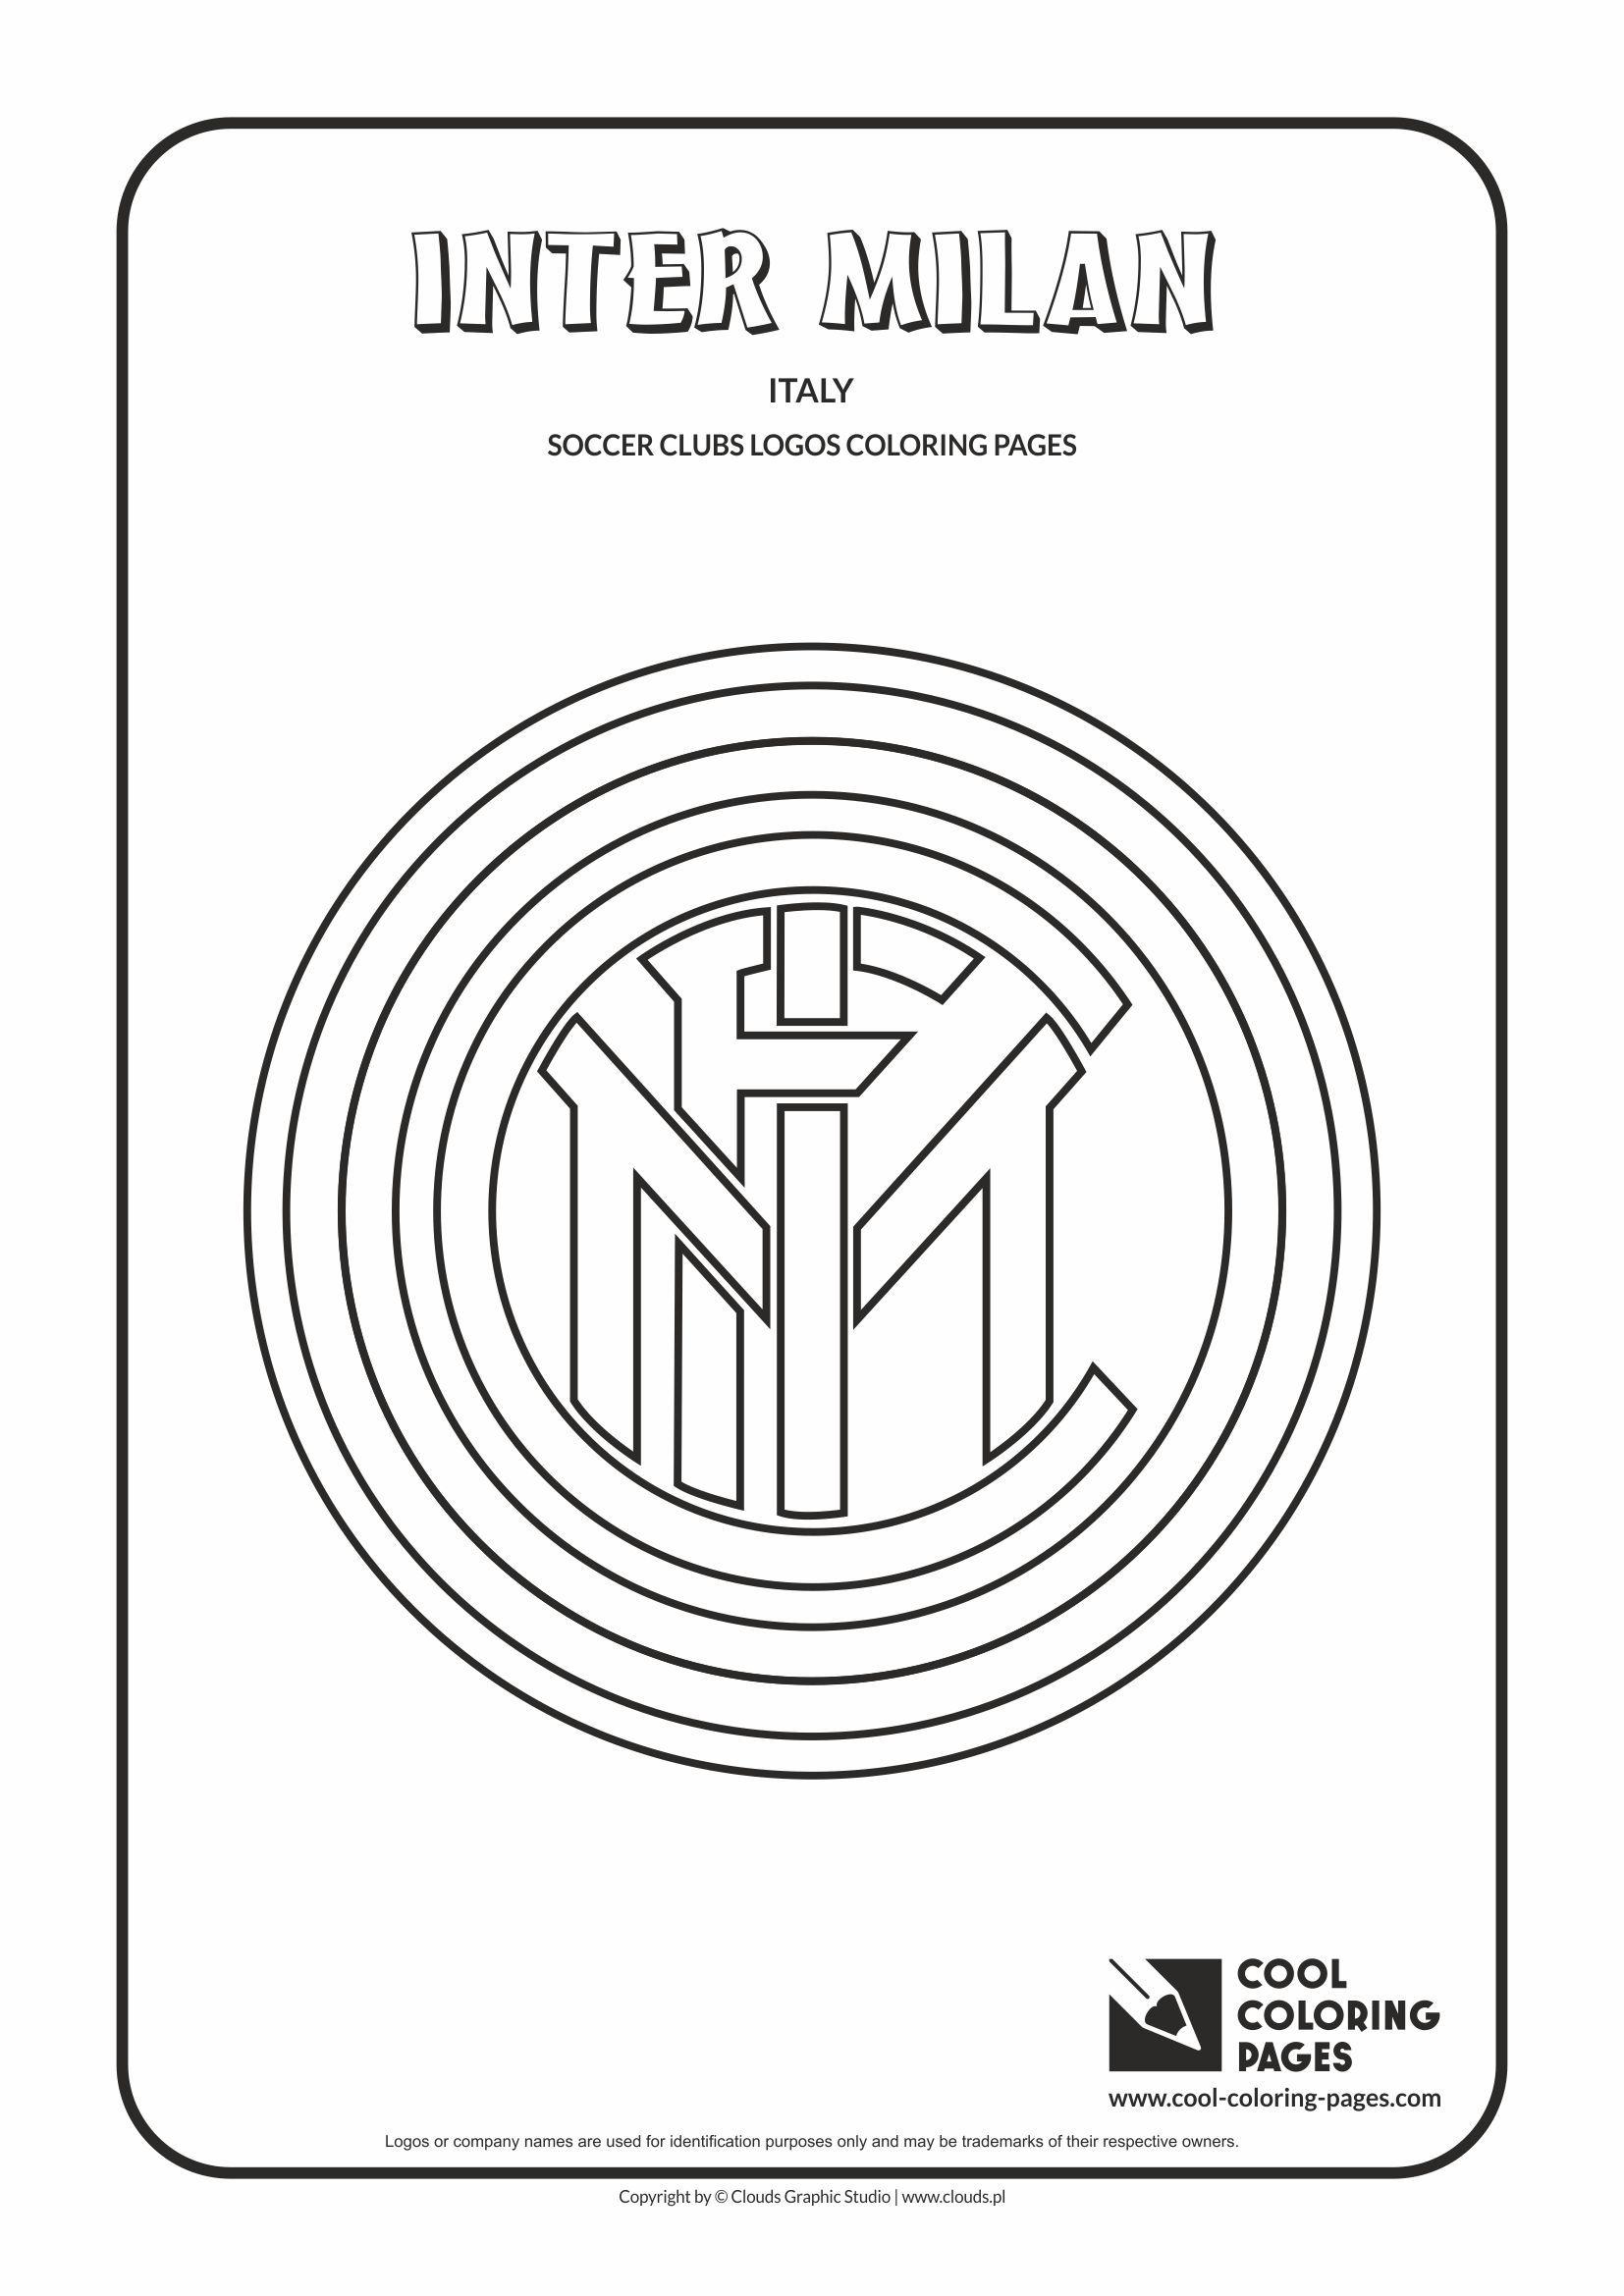 Cool Coloring Pages - Soccer Clubs Logos / Inter Milan logo ...